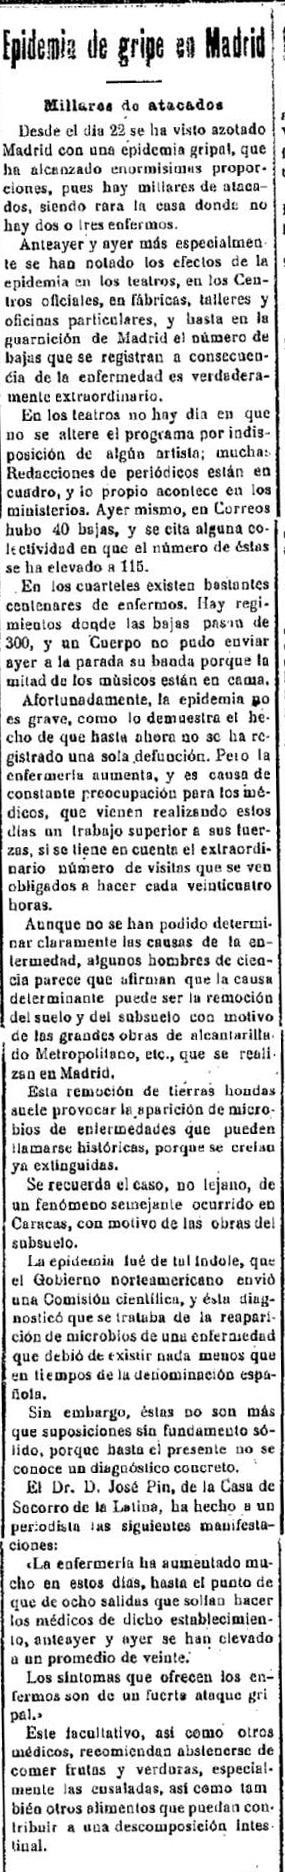 el-diario-de-pontevedra-gripe-española